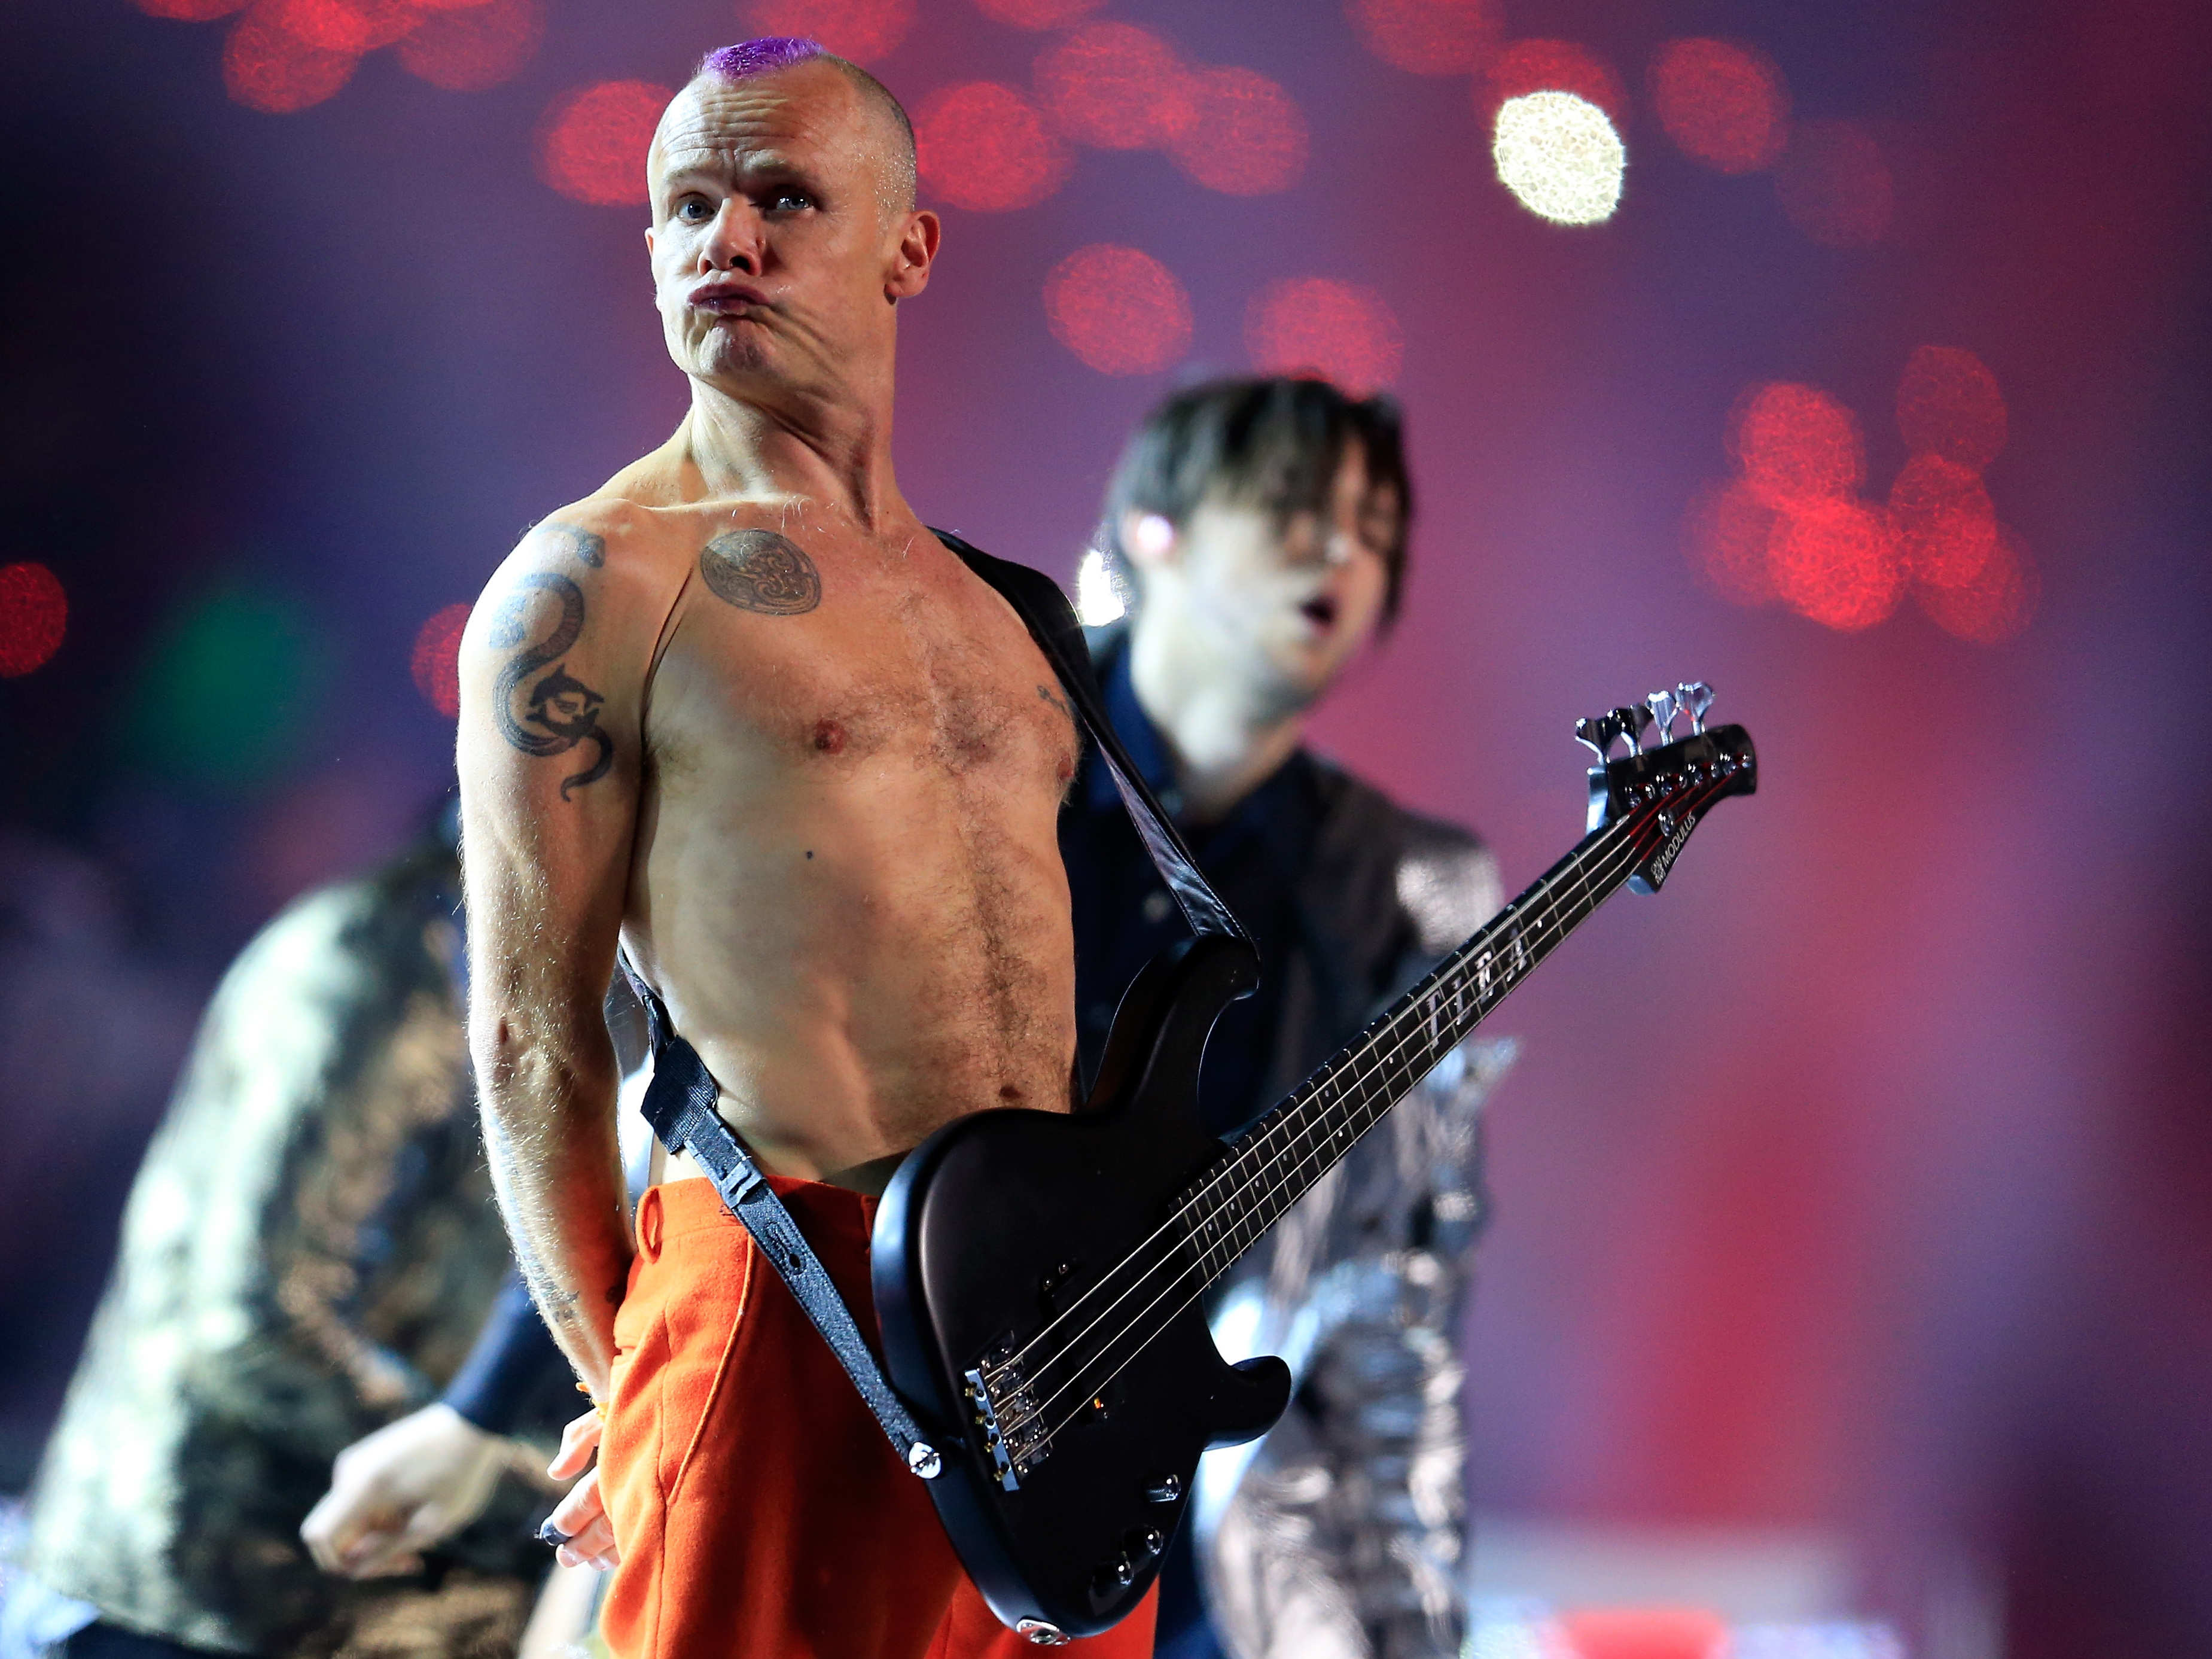 Book News: 'Socks, I've Worn A Few?' Flea Is Writing A Memoir